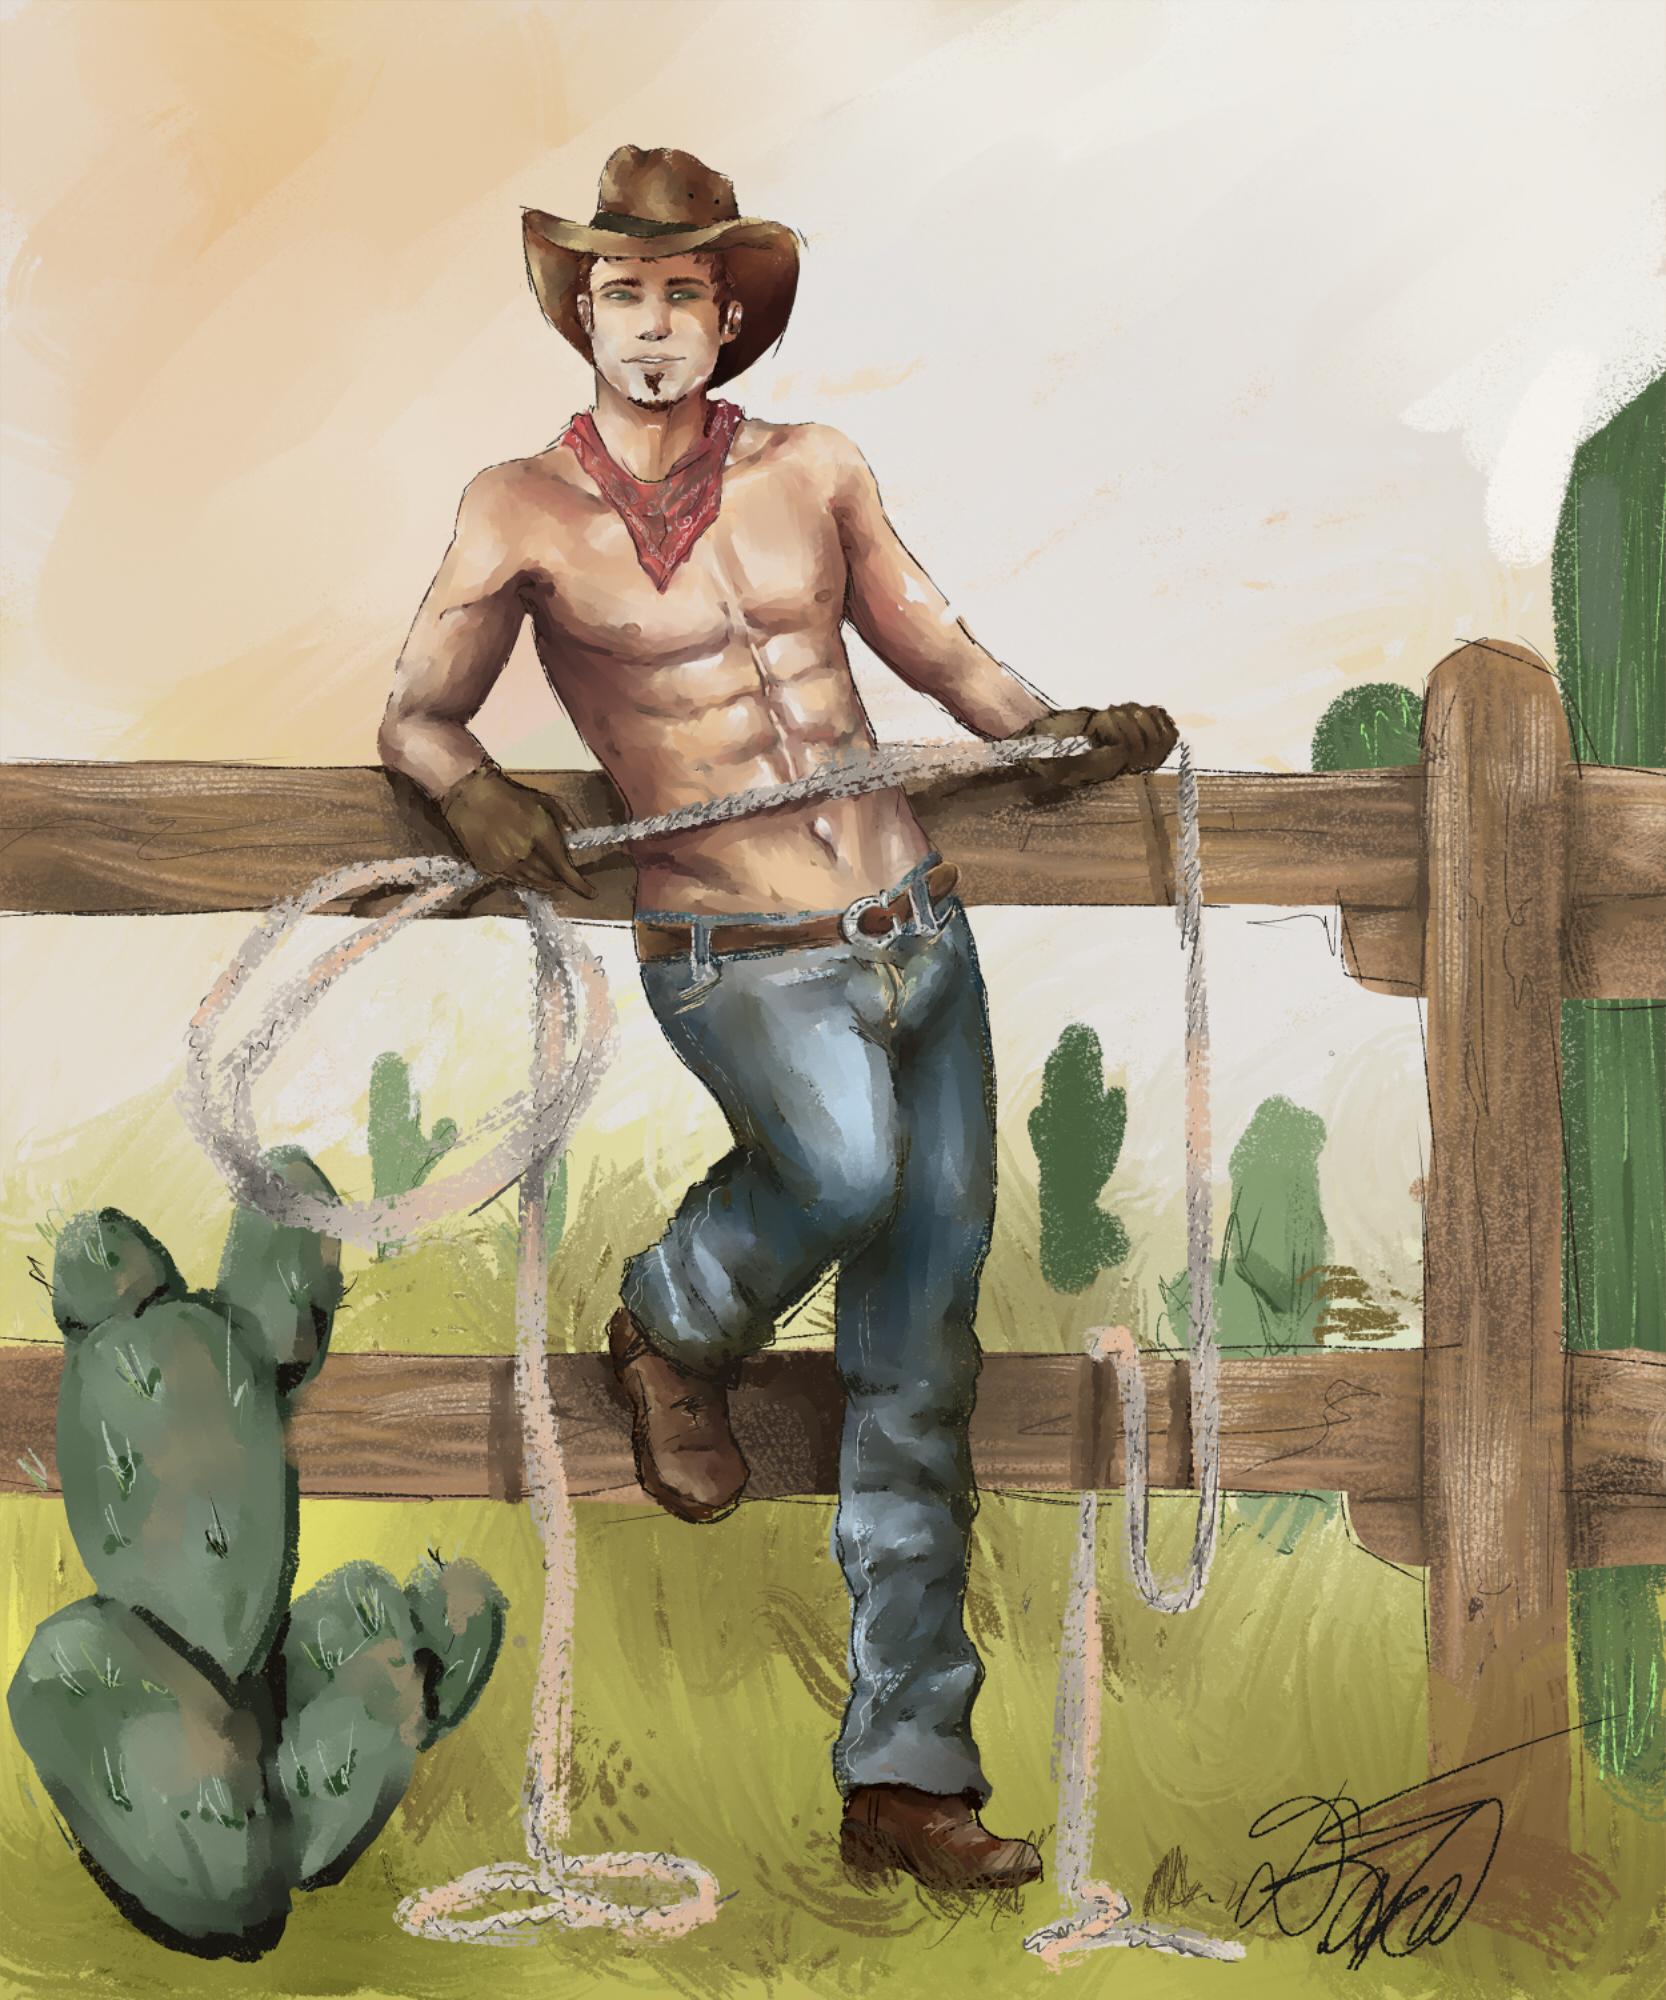 Male Pin up - Hi Cowboy!